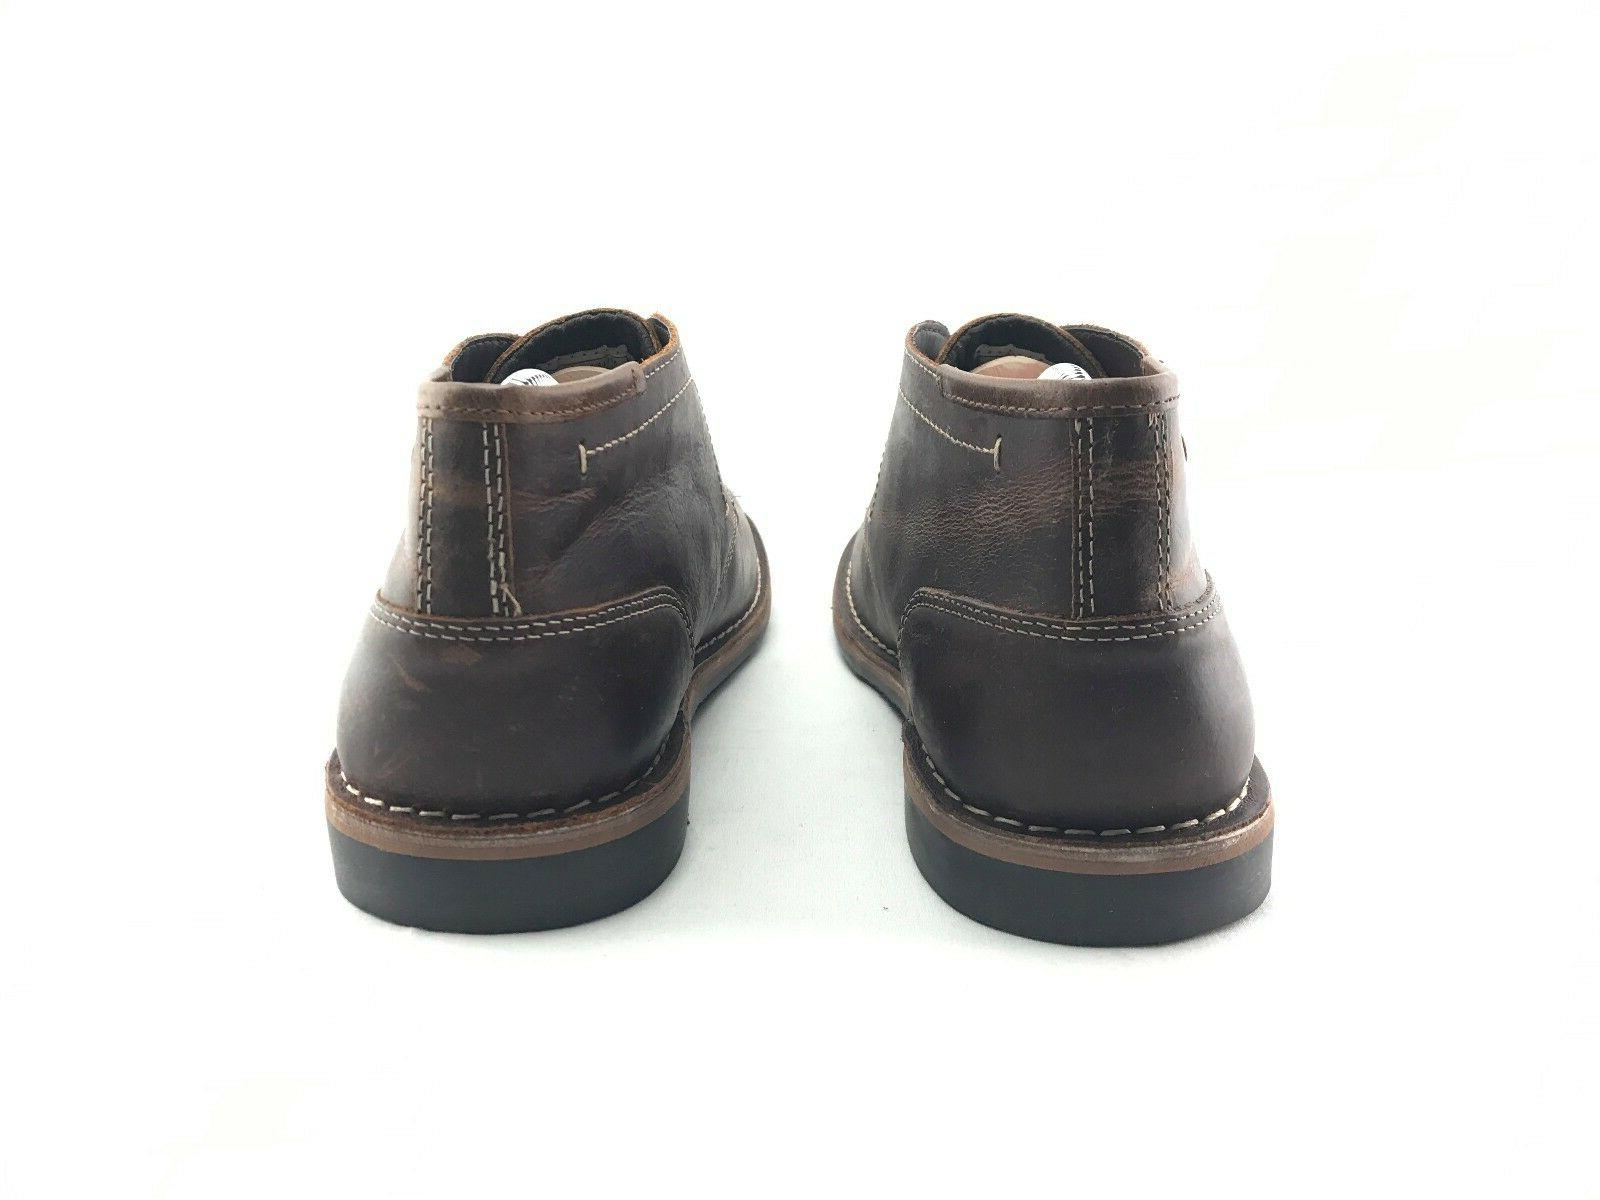 Steve Brown Chukka US Shoes